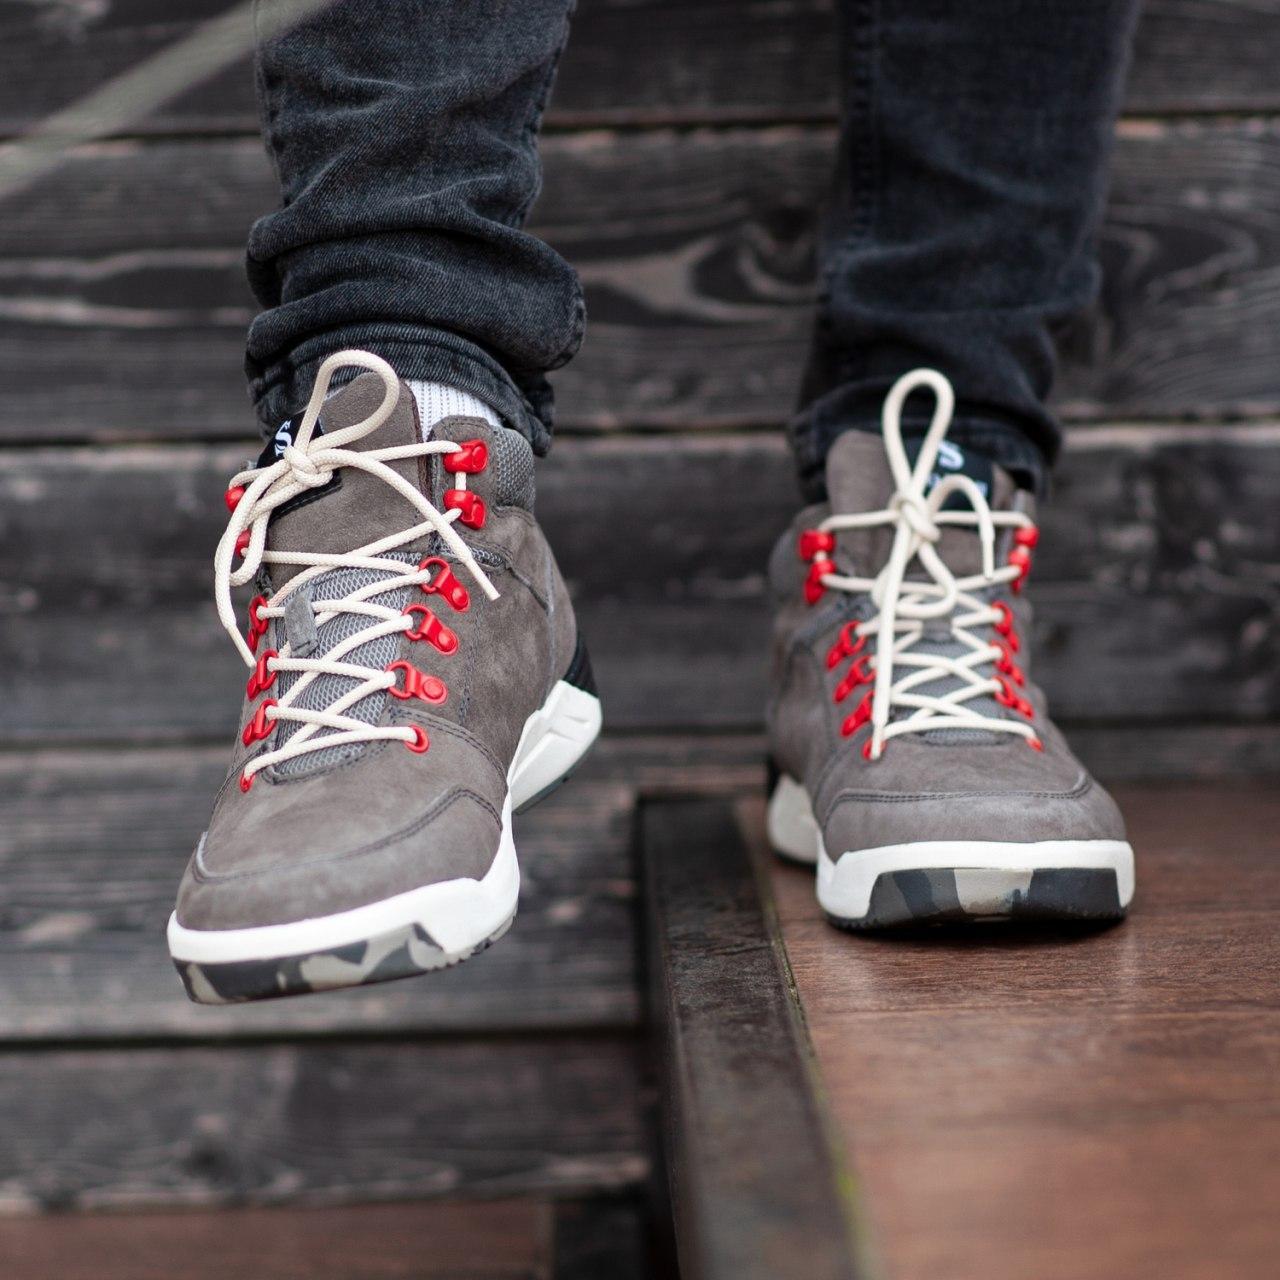 Ботинки South fenix grey - фото 4